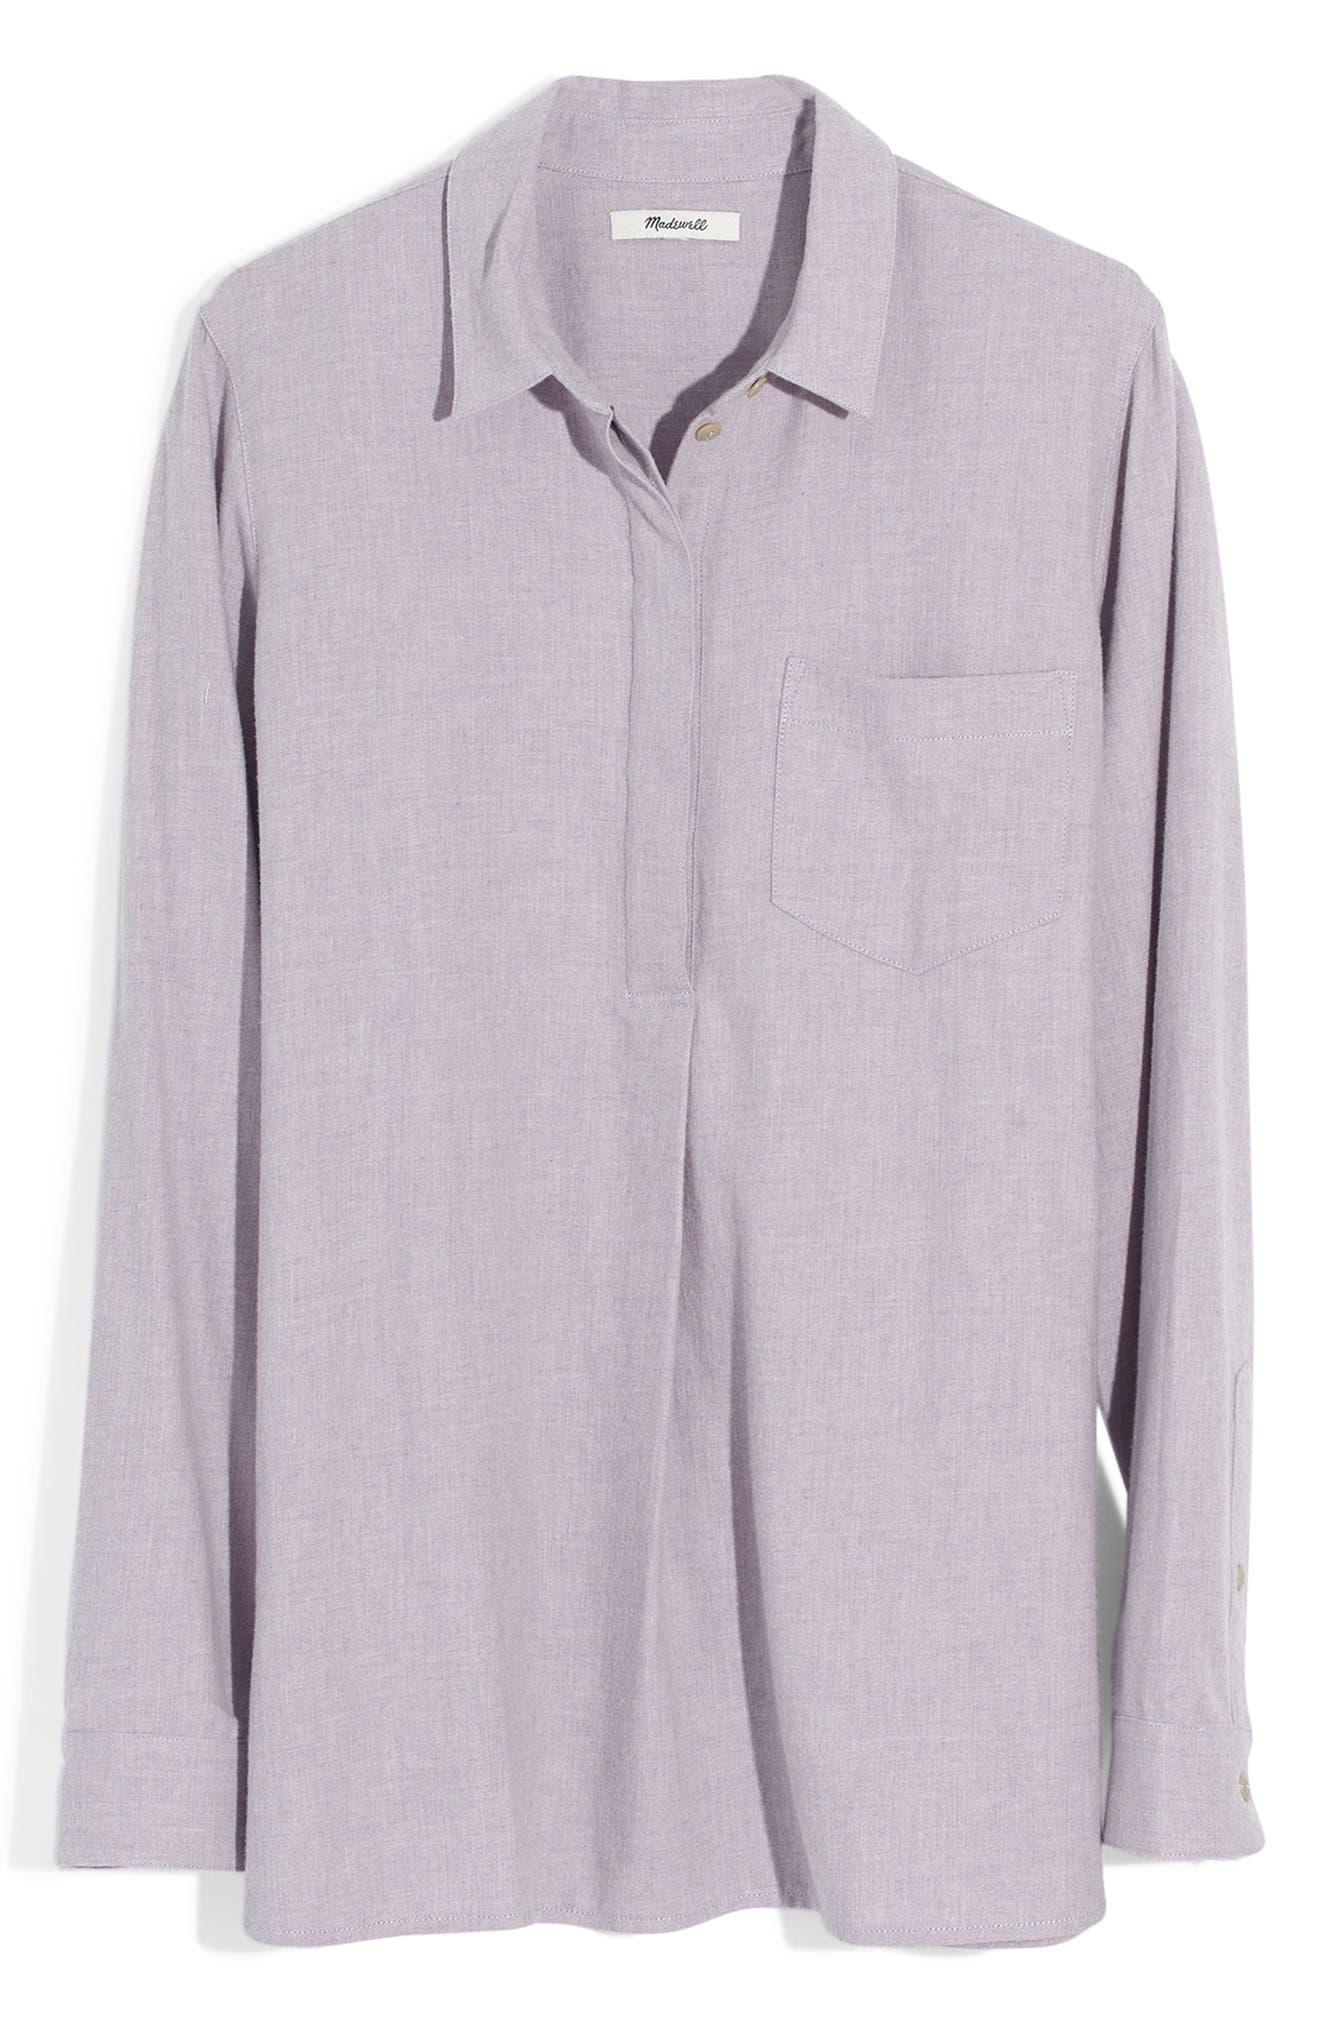 MADEWELL,                             Ex-Boyfriend Button Back Flannel Shirt,                             Alternate thumbnail 5, color,                             HEATHER THISTLE